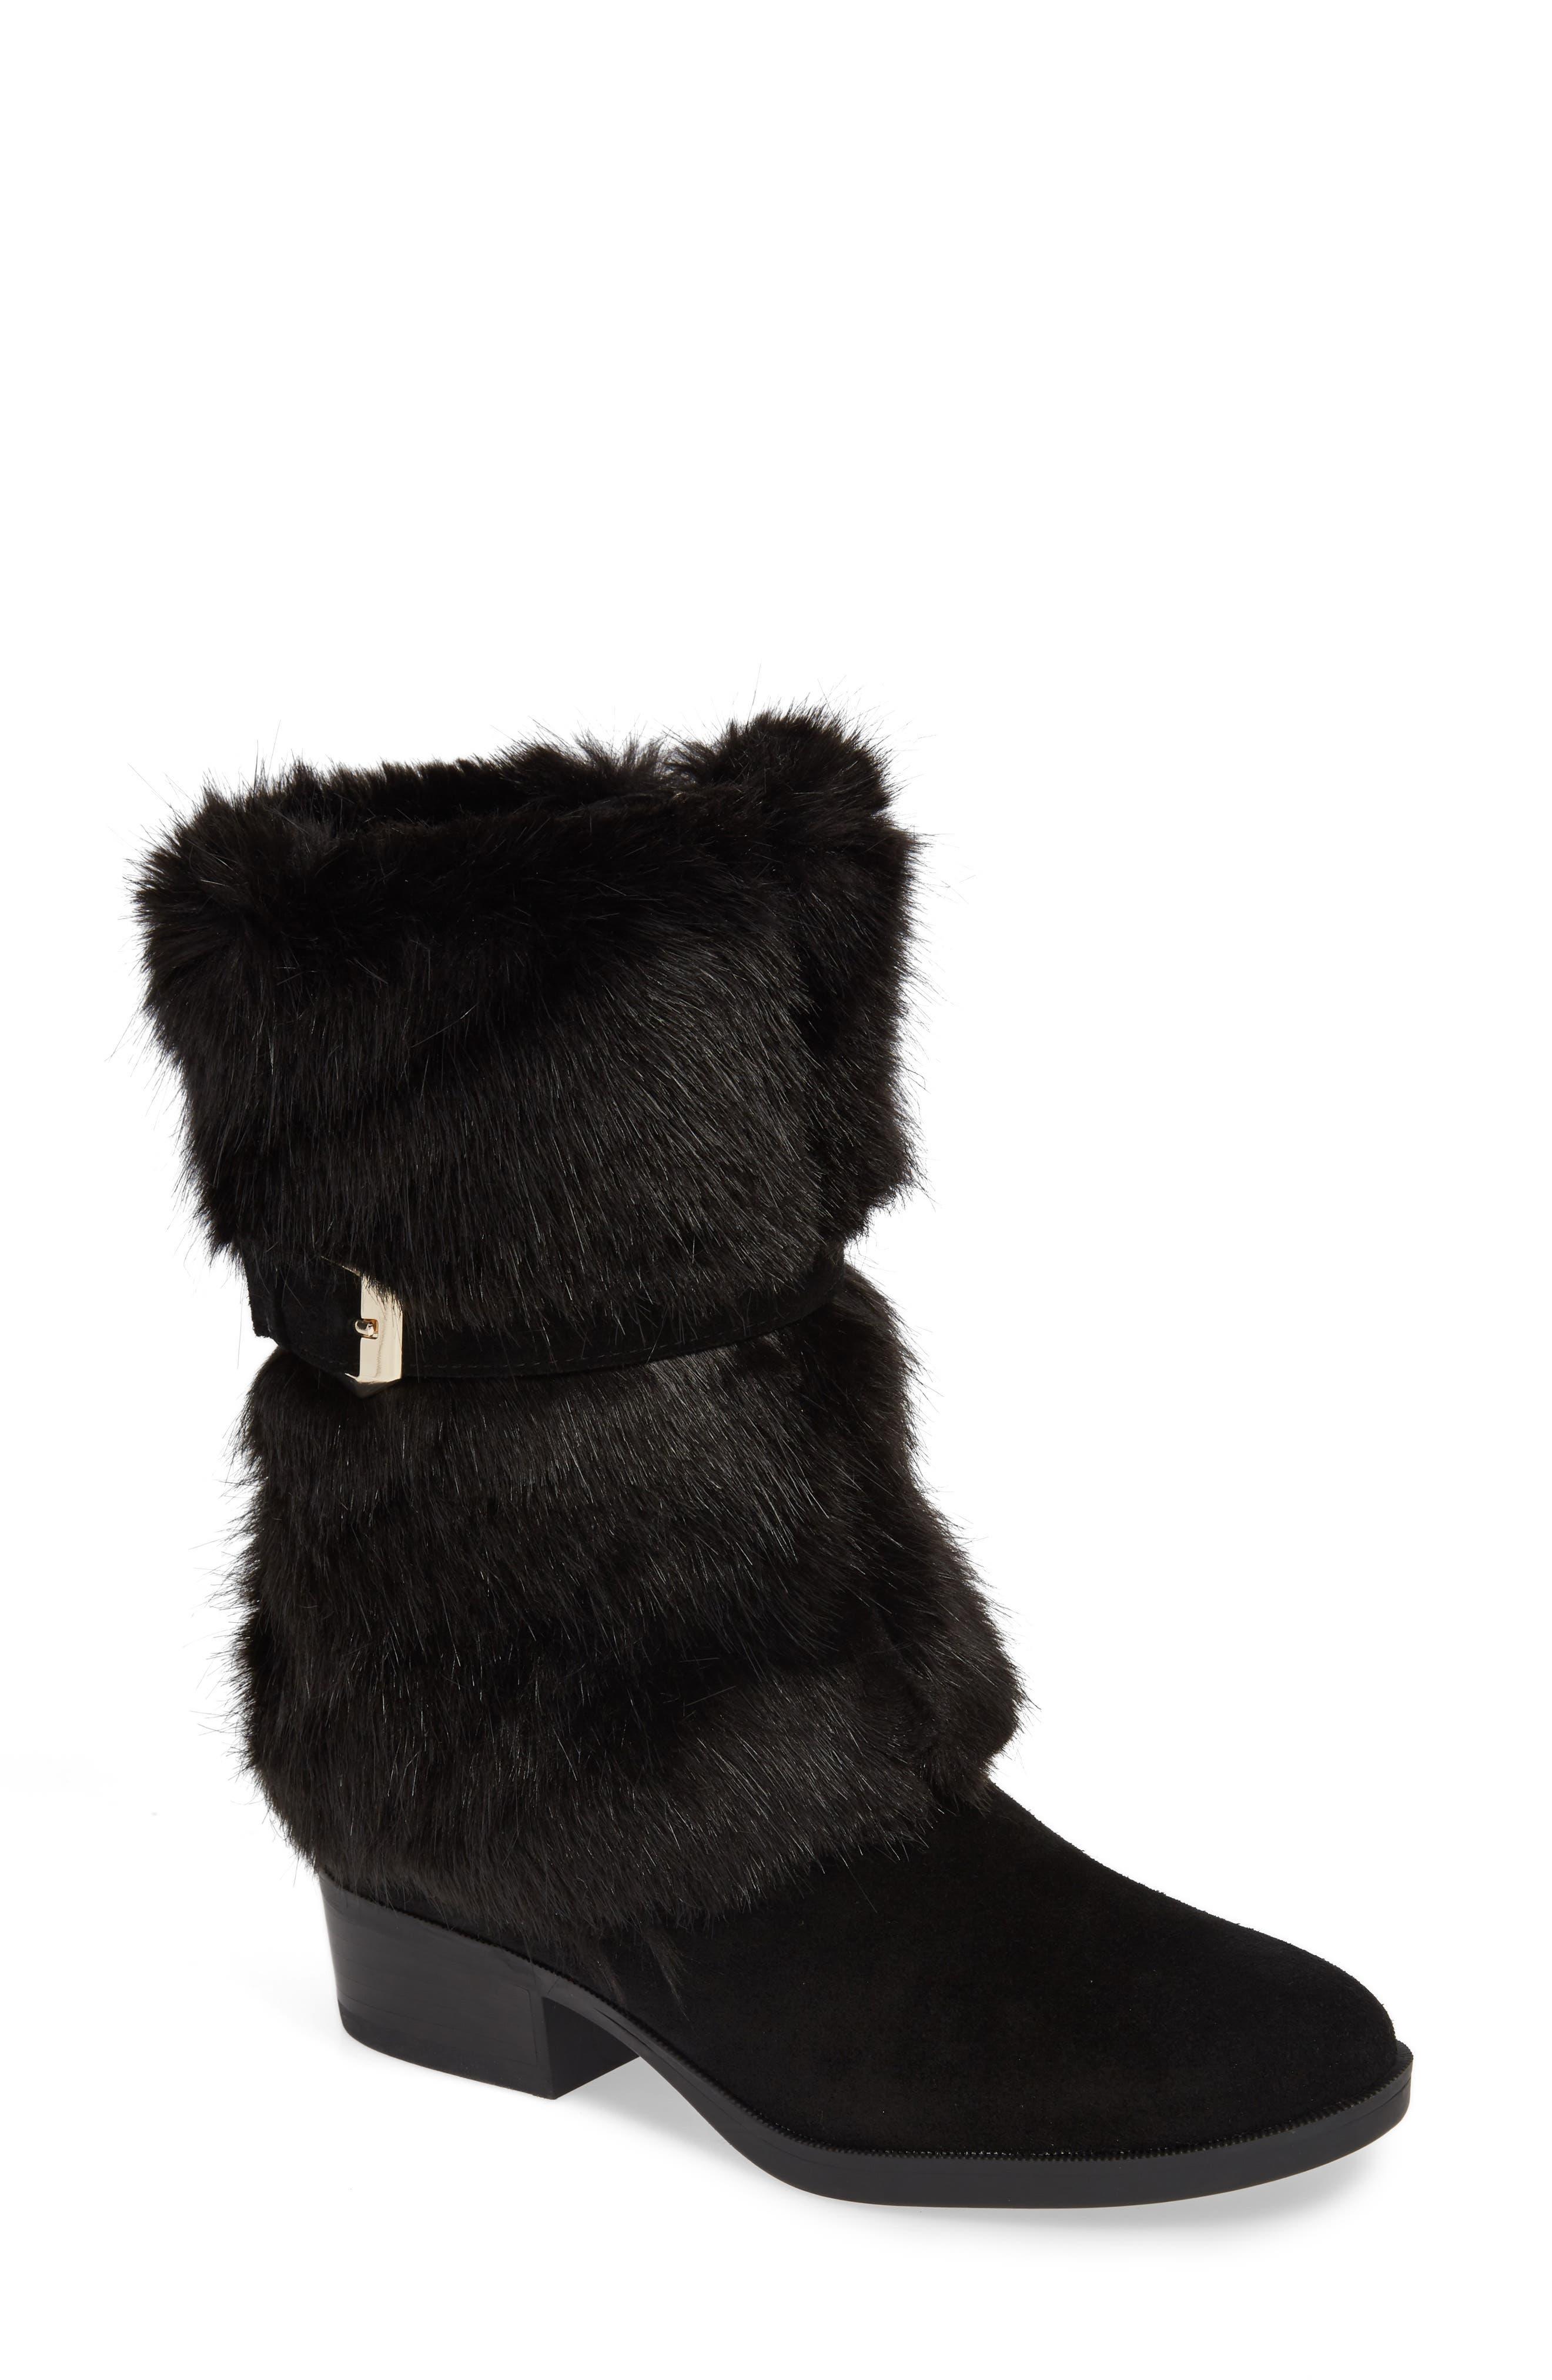 Giselle Water Resistant Faux Fur Boot, Main, color, BLACK SUEDE